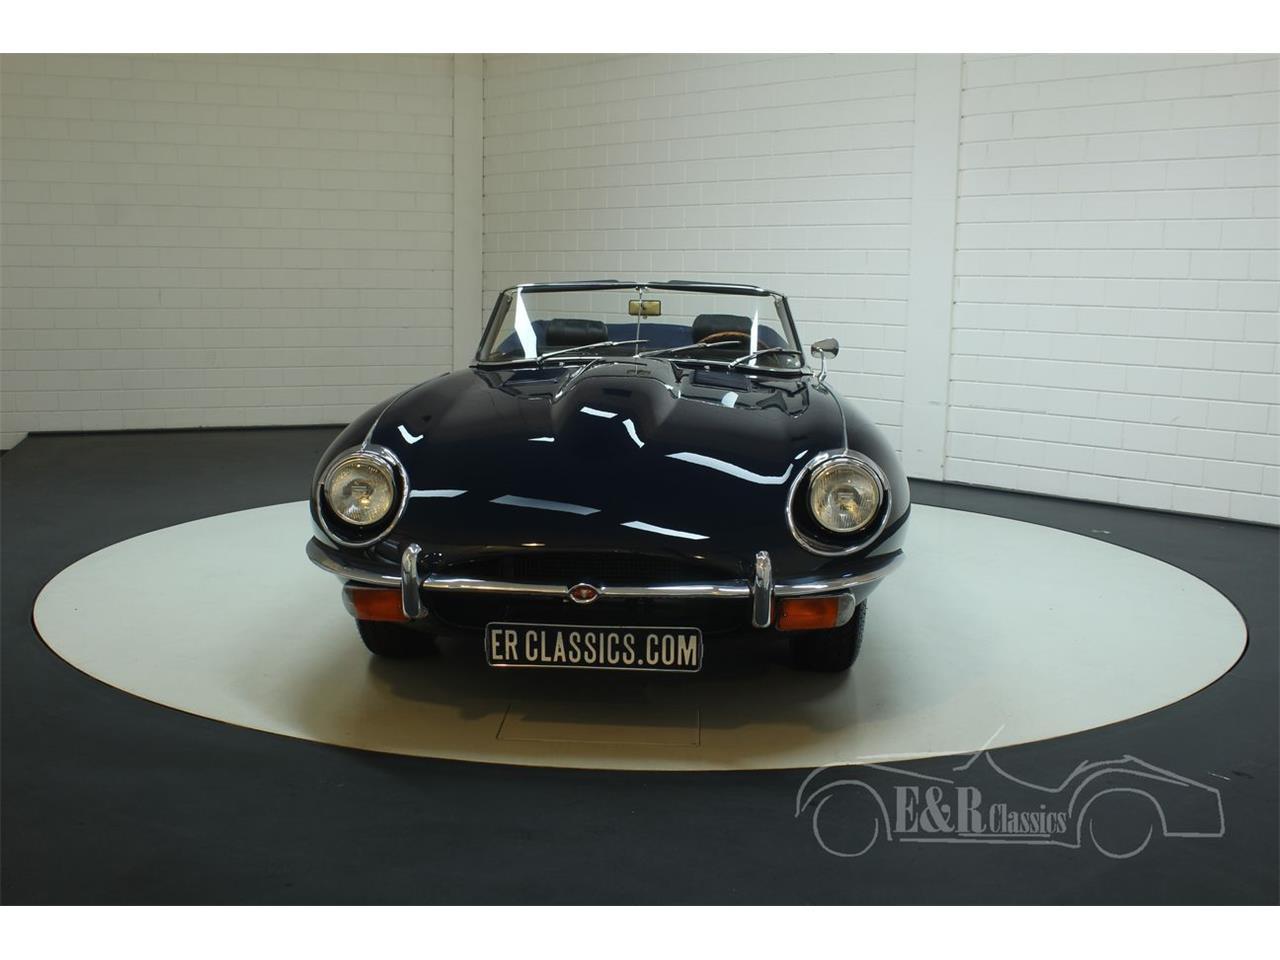 Large Picture of 1969 Jaguar E-Type located in Waalwijk Noord-Brabant - $139,400.00 - Q45K